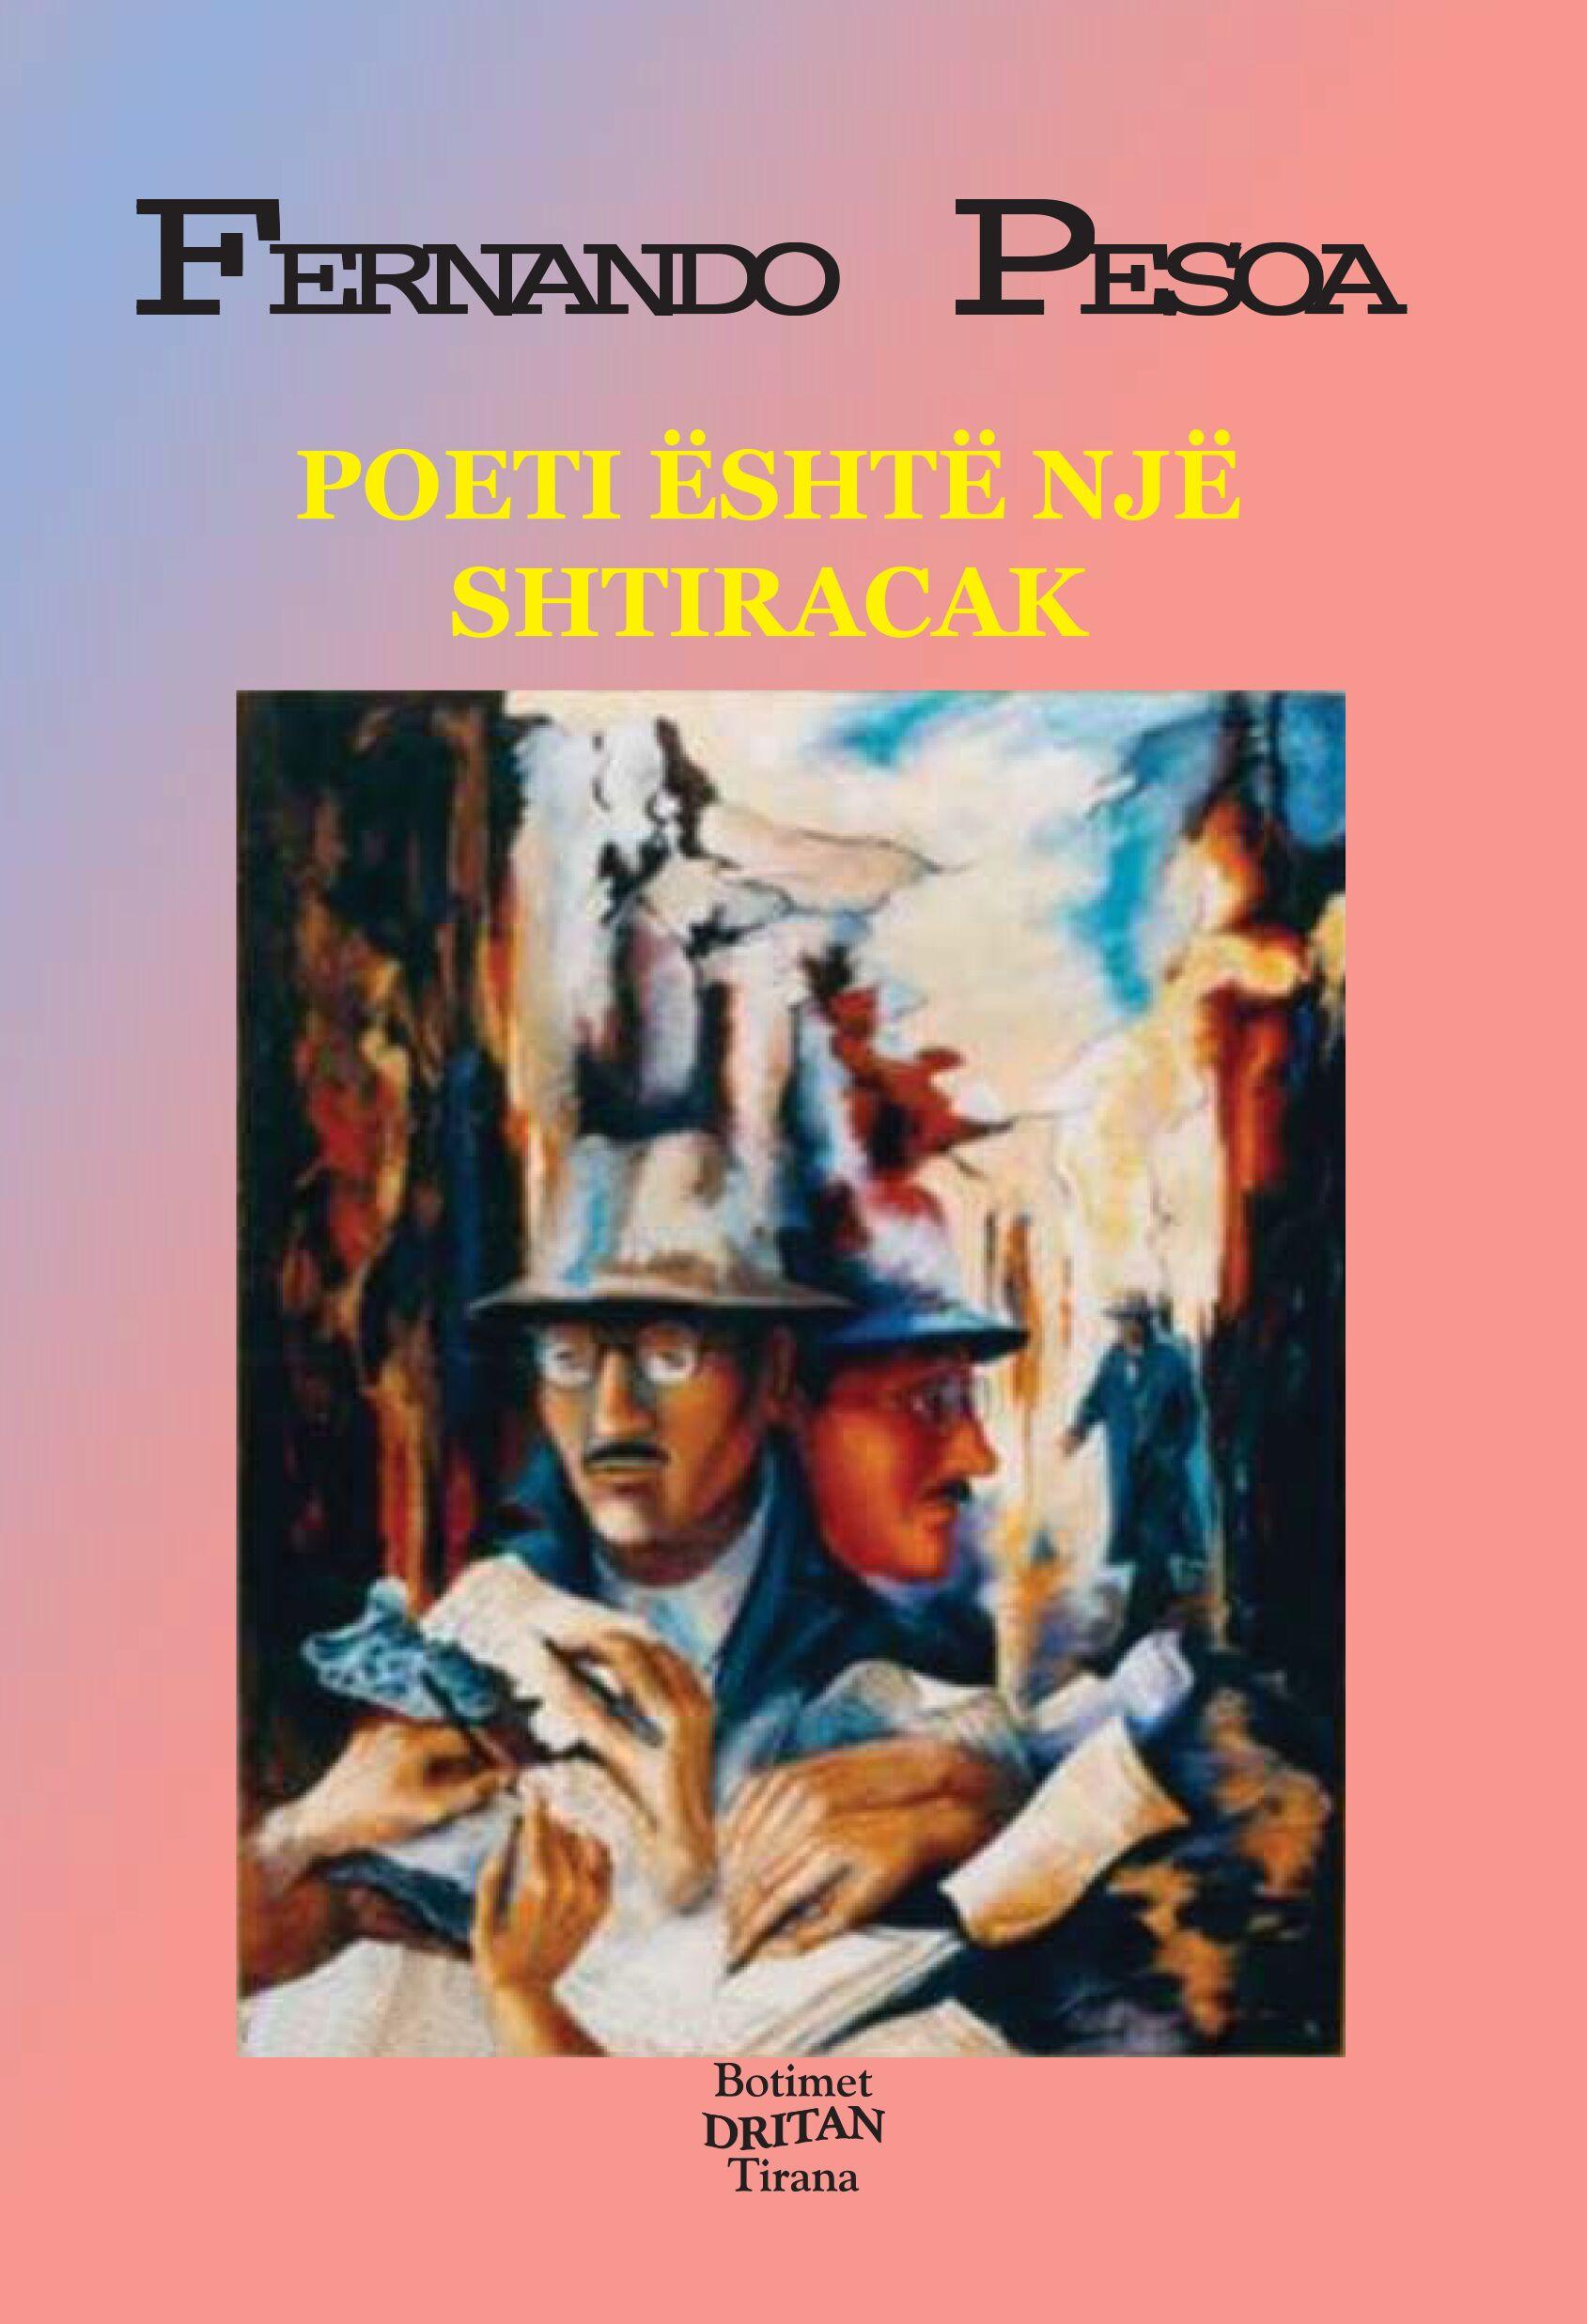 Poeti eshte nje shtiracak